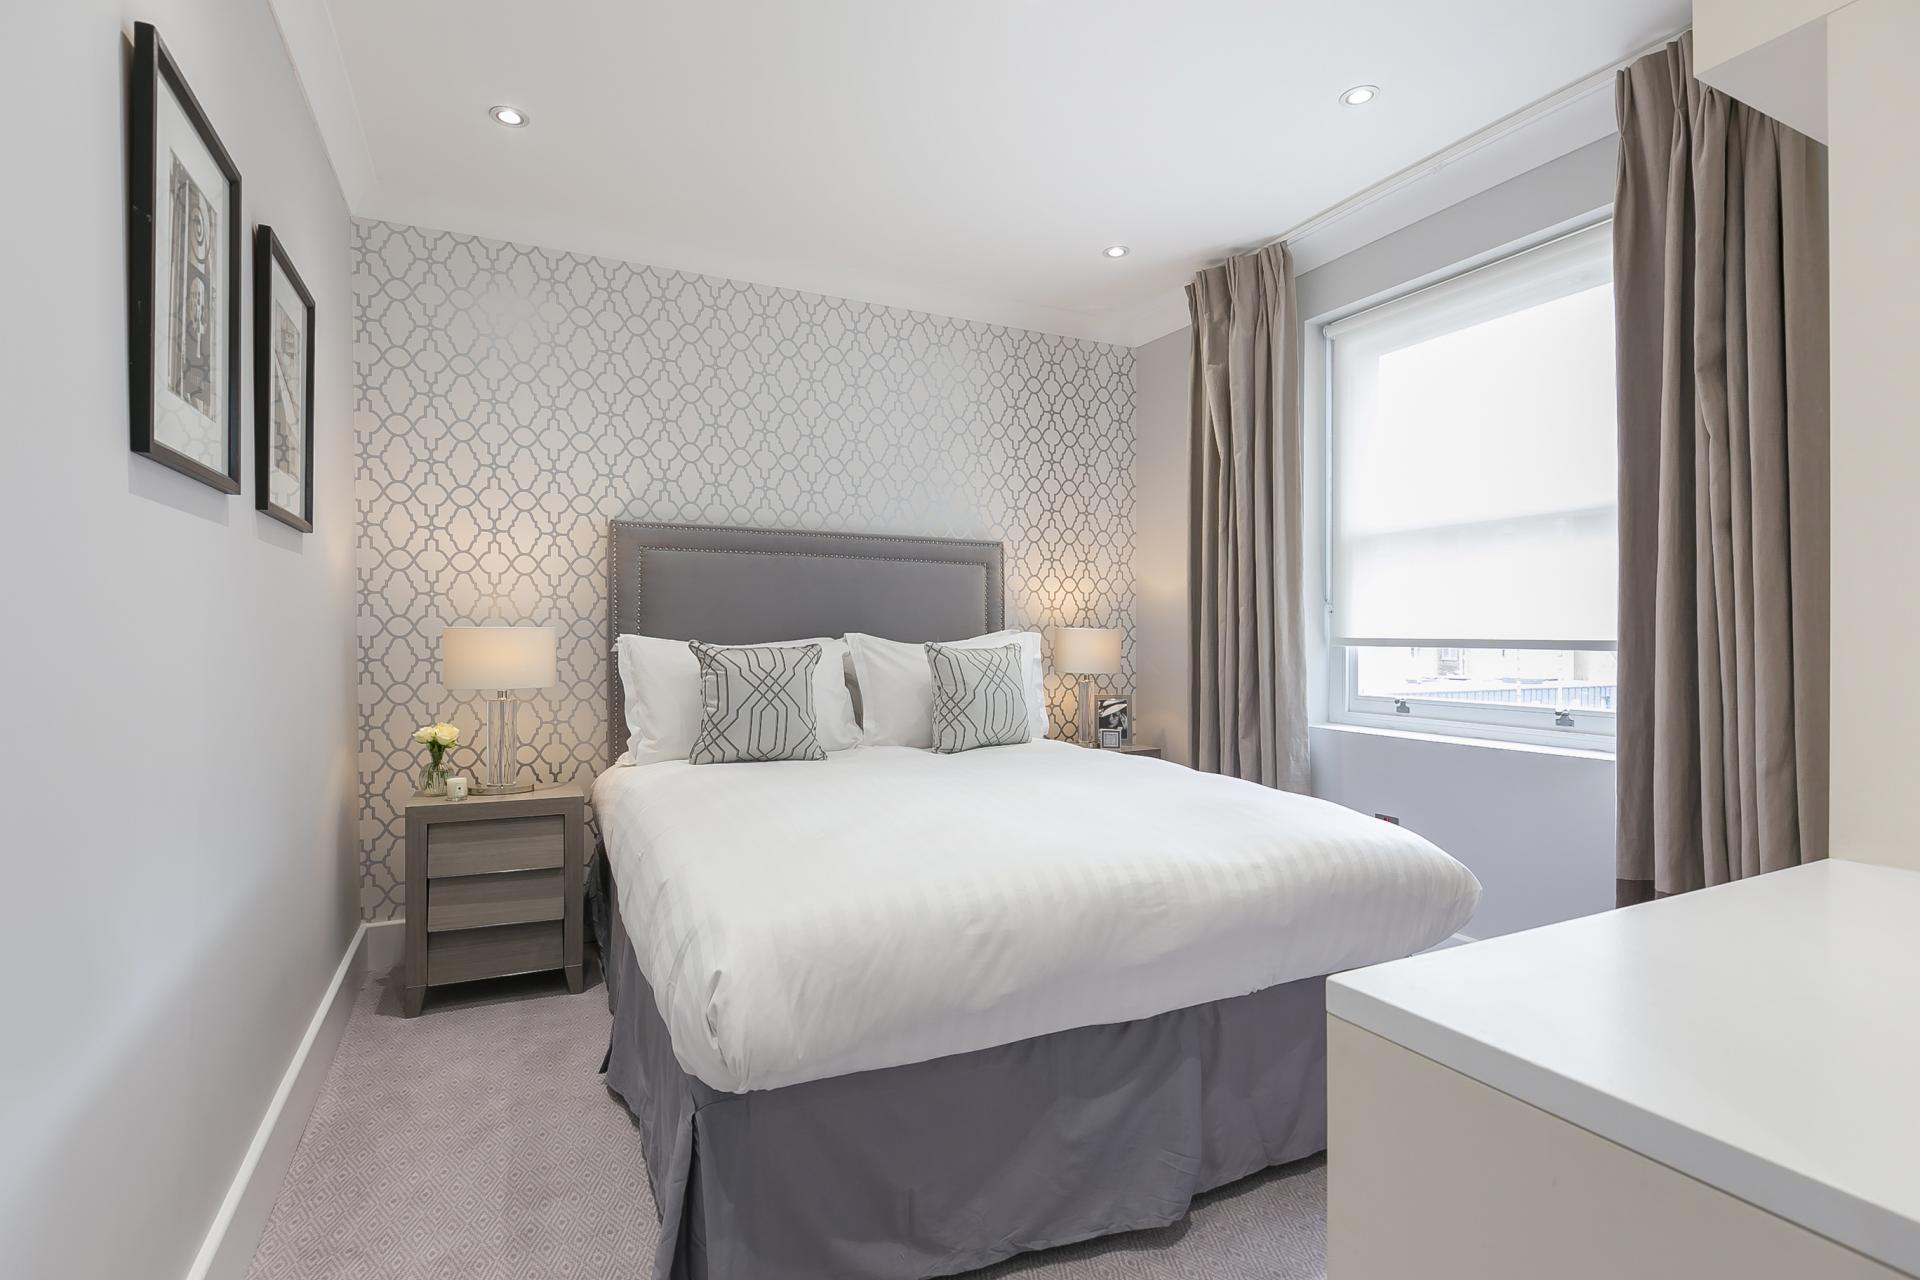 Bed at Chilworth Court Serviced Apartments, Paddington, London